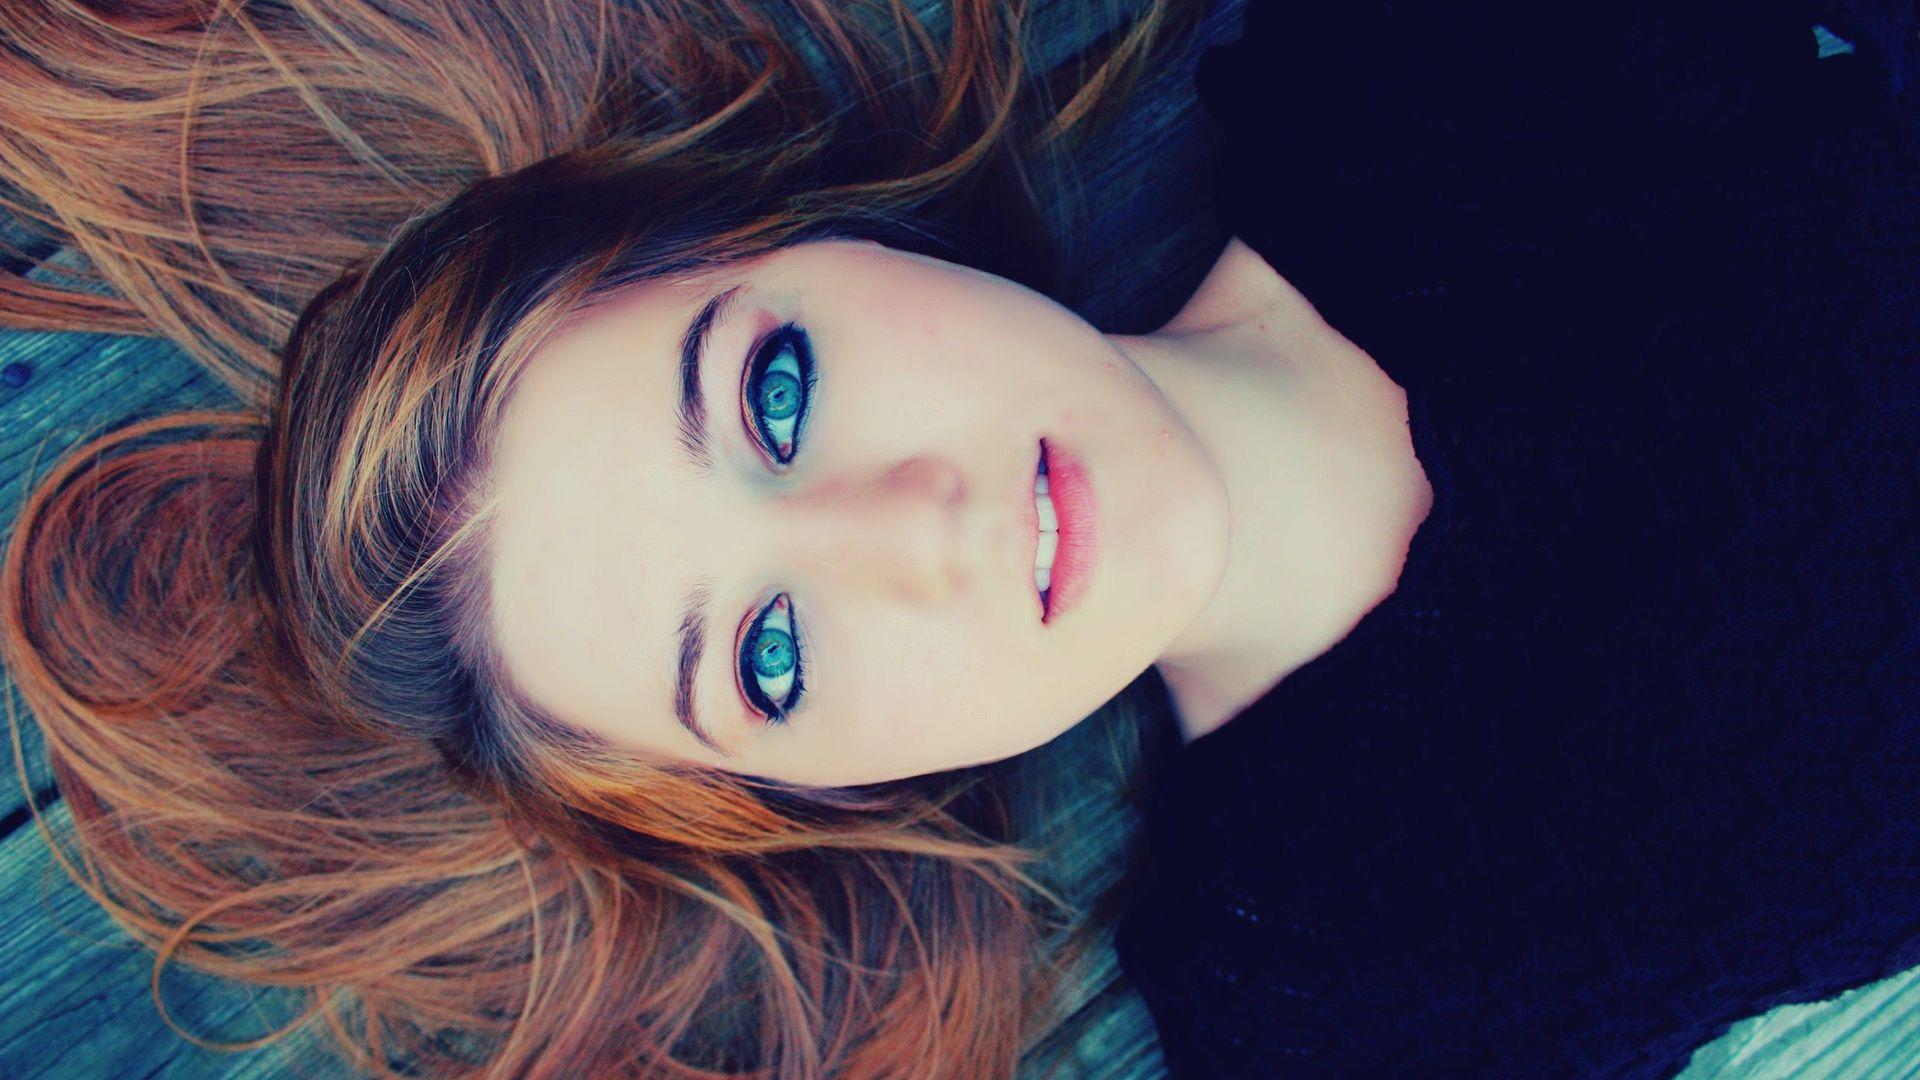 Hd wallpaper eyes - Blue Eyes Wallpaper 28565